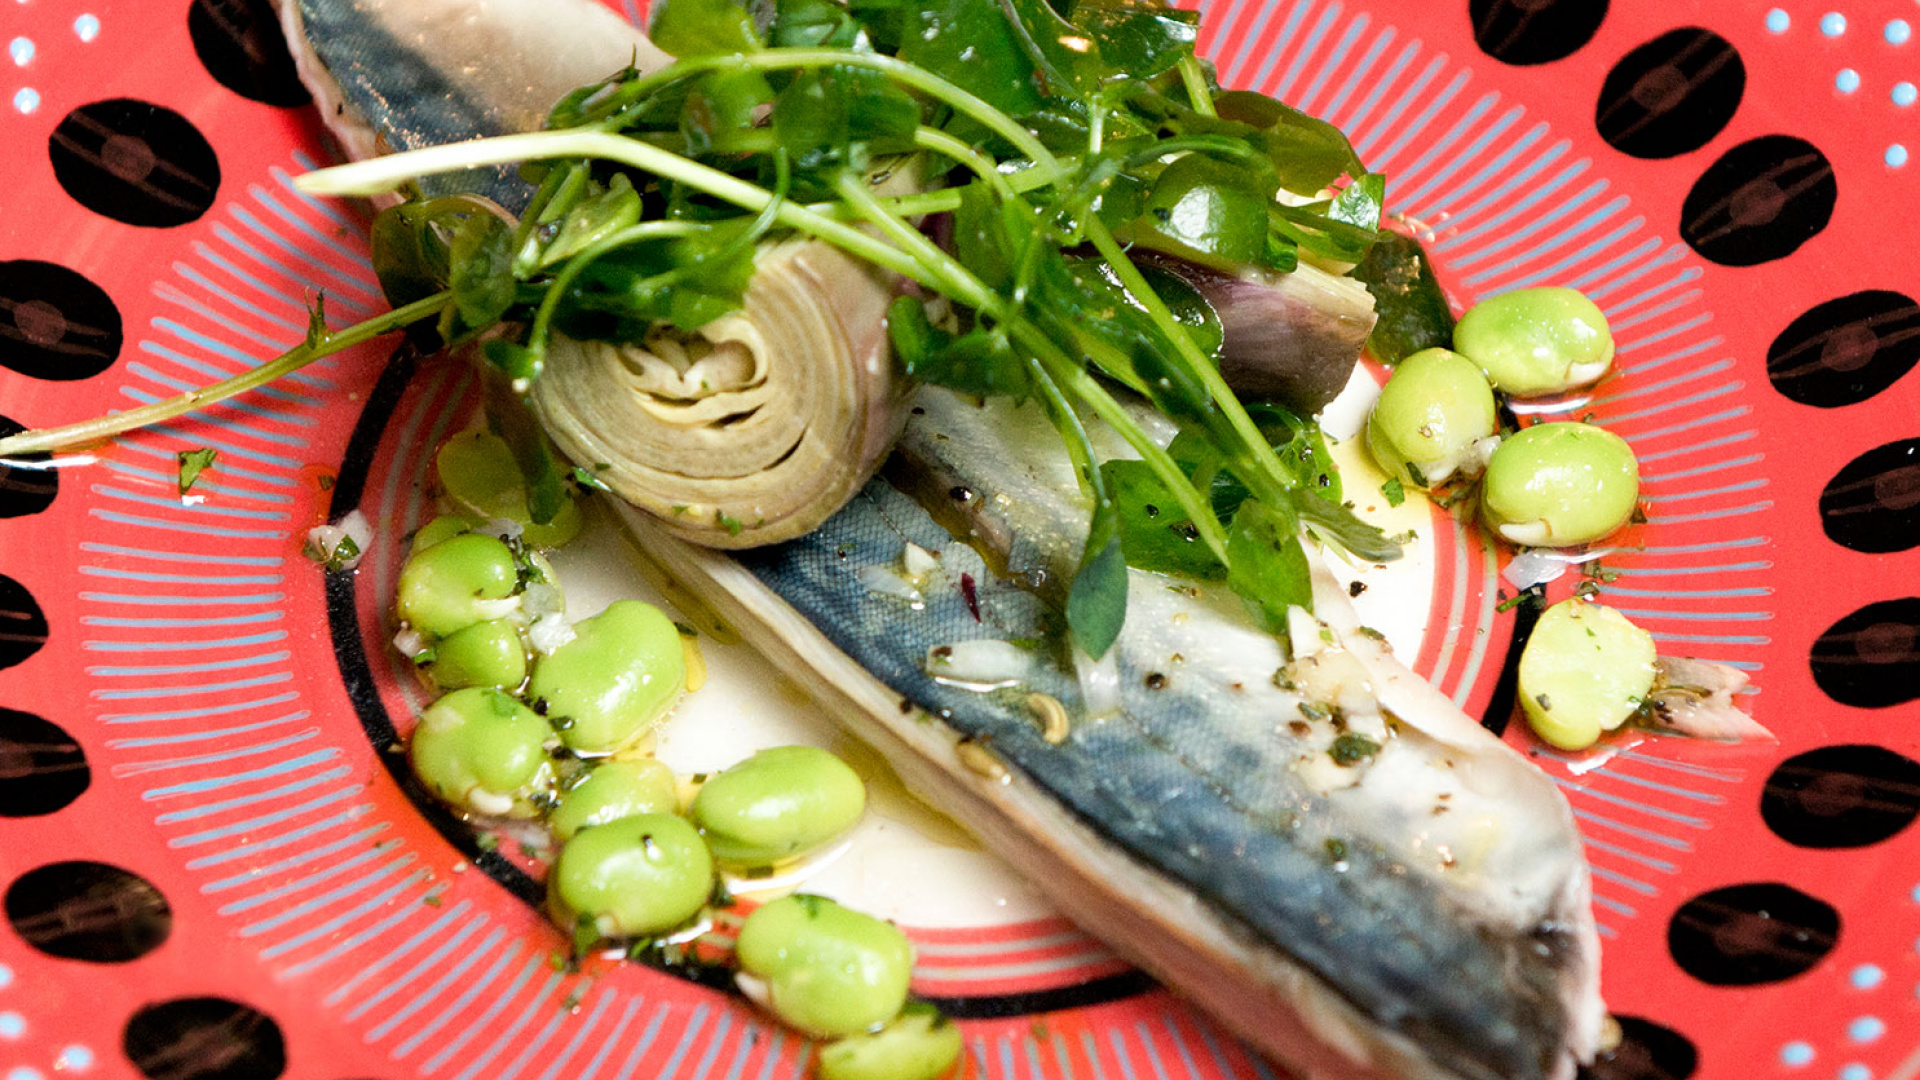 Pescatori's recipe for curing mackerel